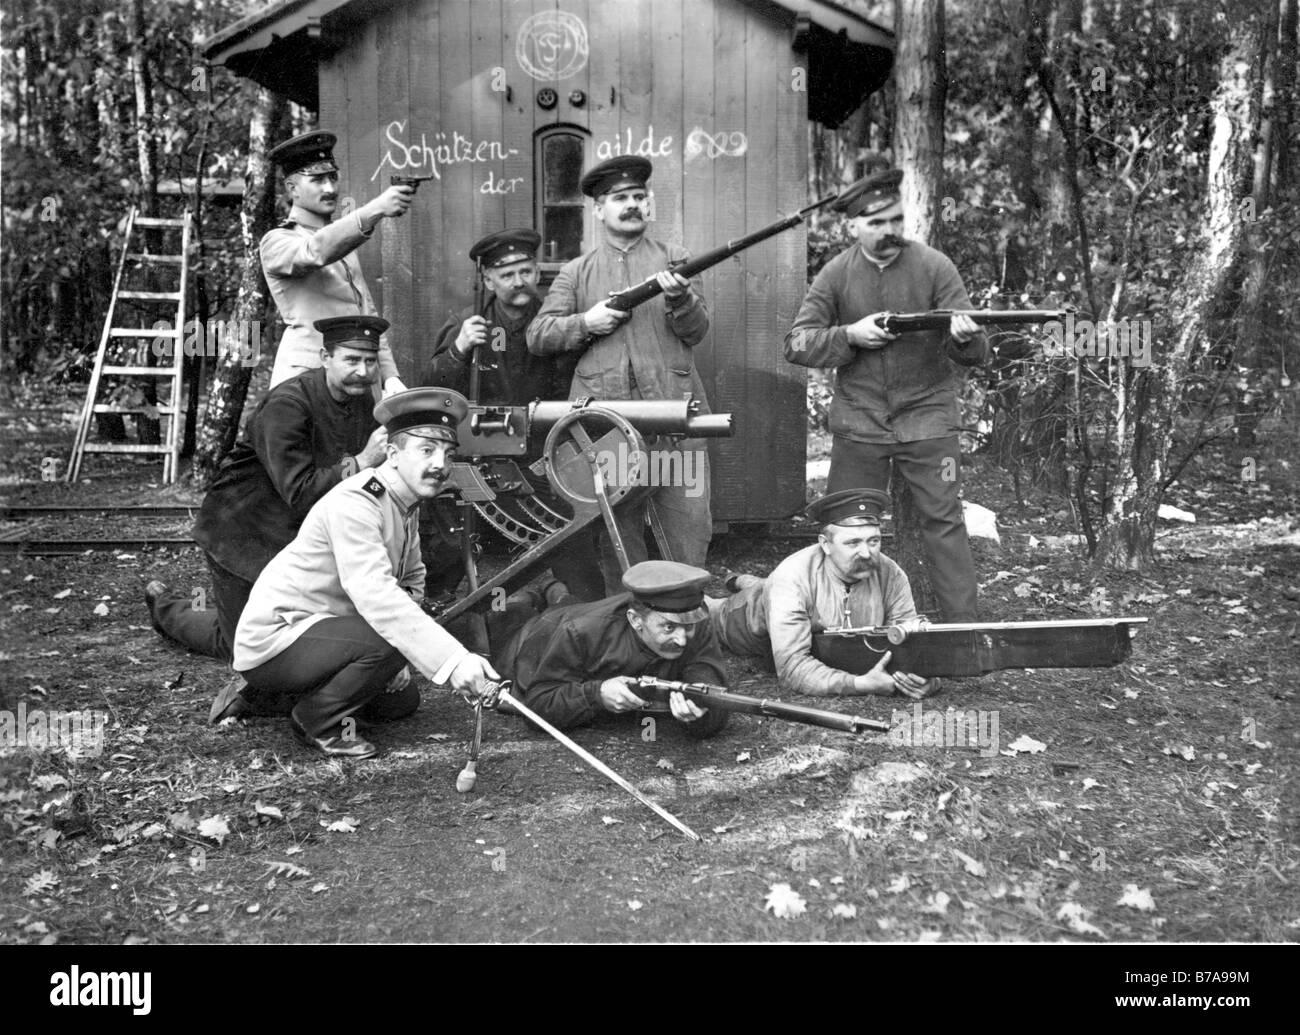 Historical photo, men testing rifles, including machine-gun Spandau 08, ca. 1915 - Stock Image